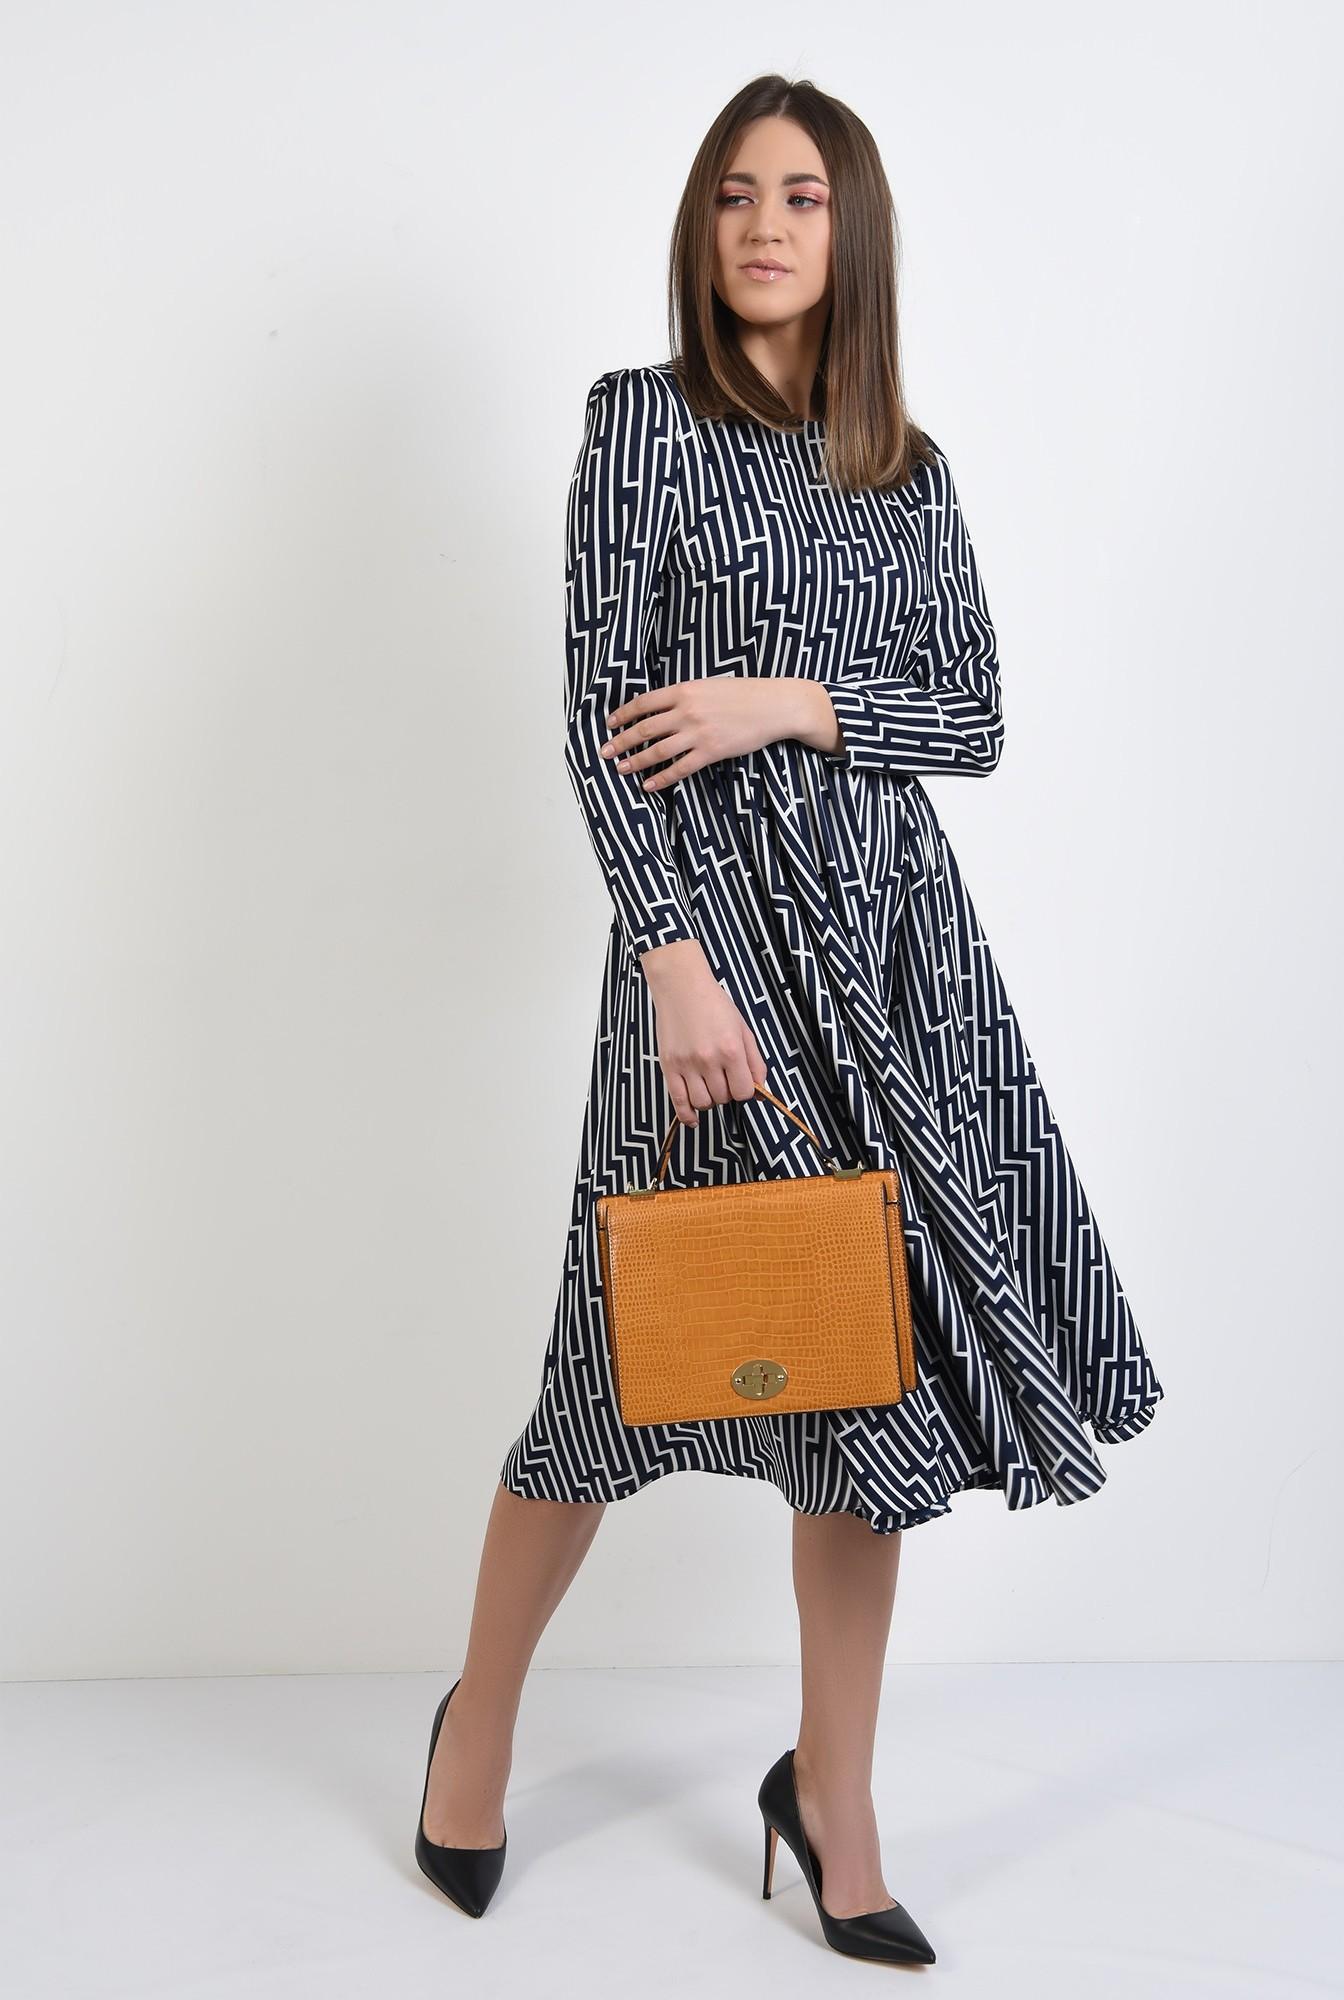 3 -  rochie midi, evazata, cu motive geometrice, maneci lungi, bleumarin